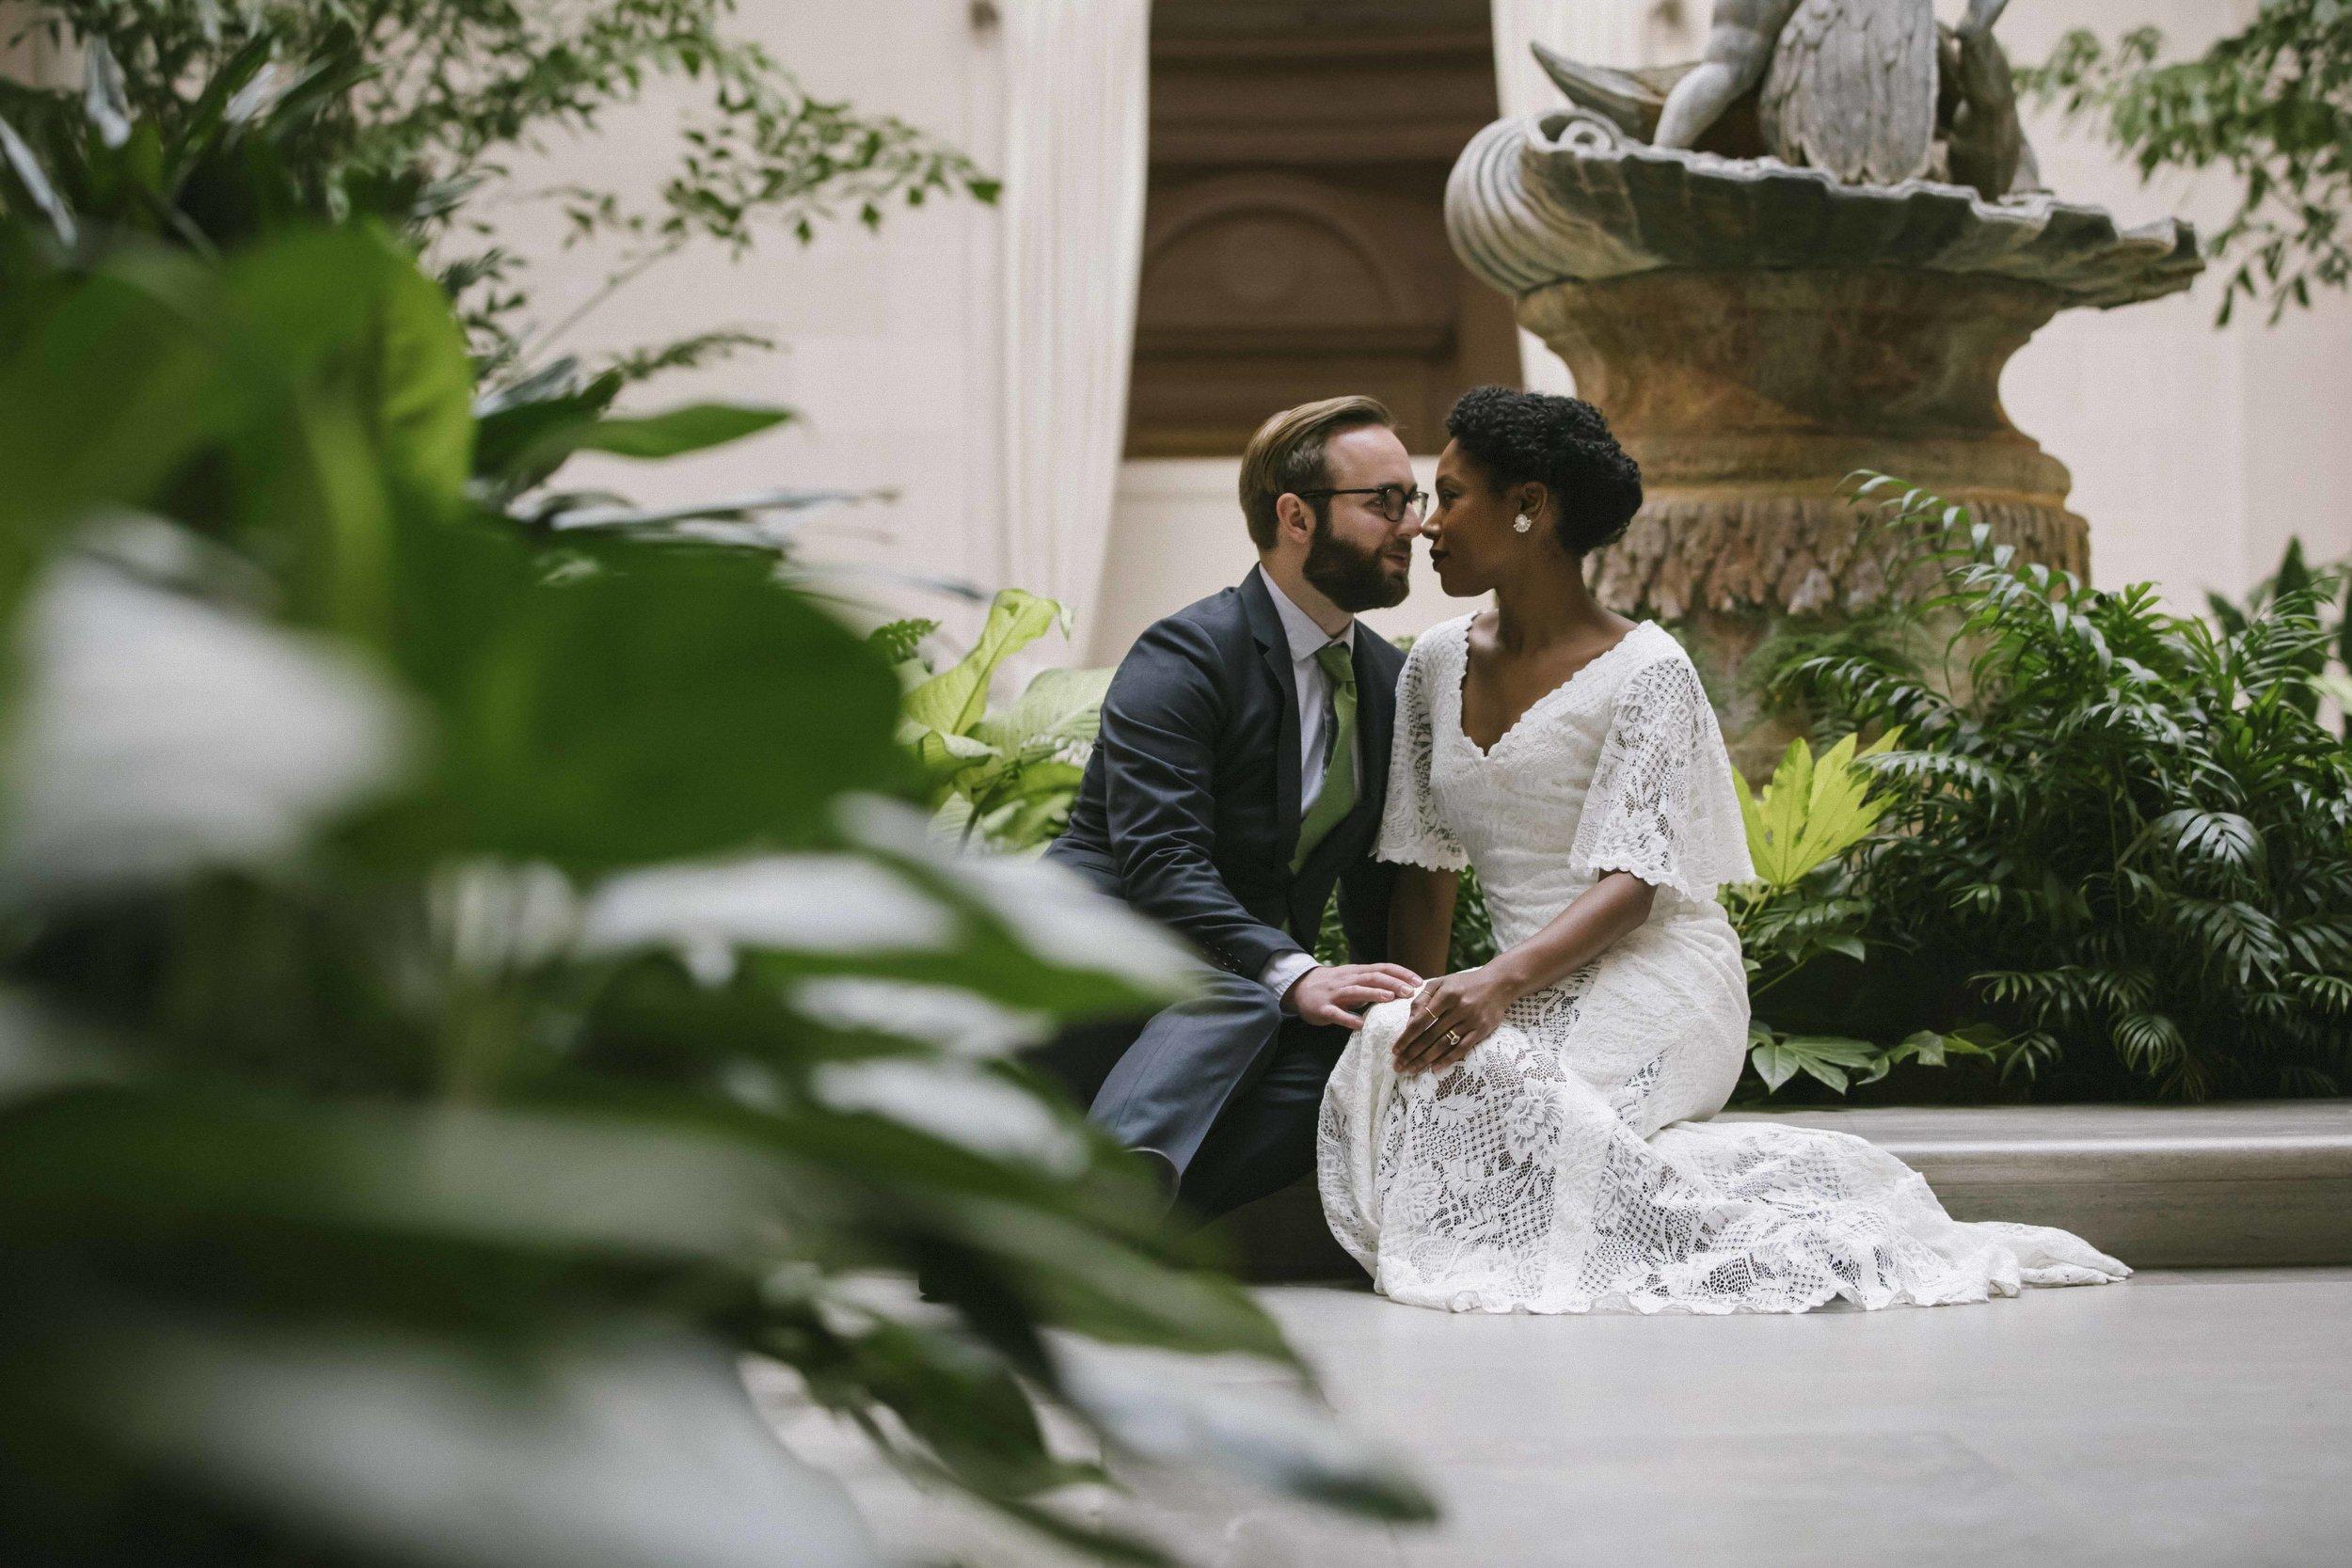 CandP_wedding (17).jpg